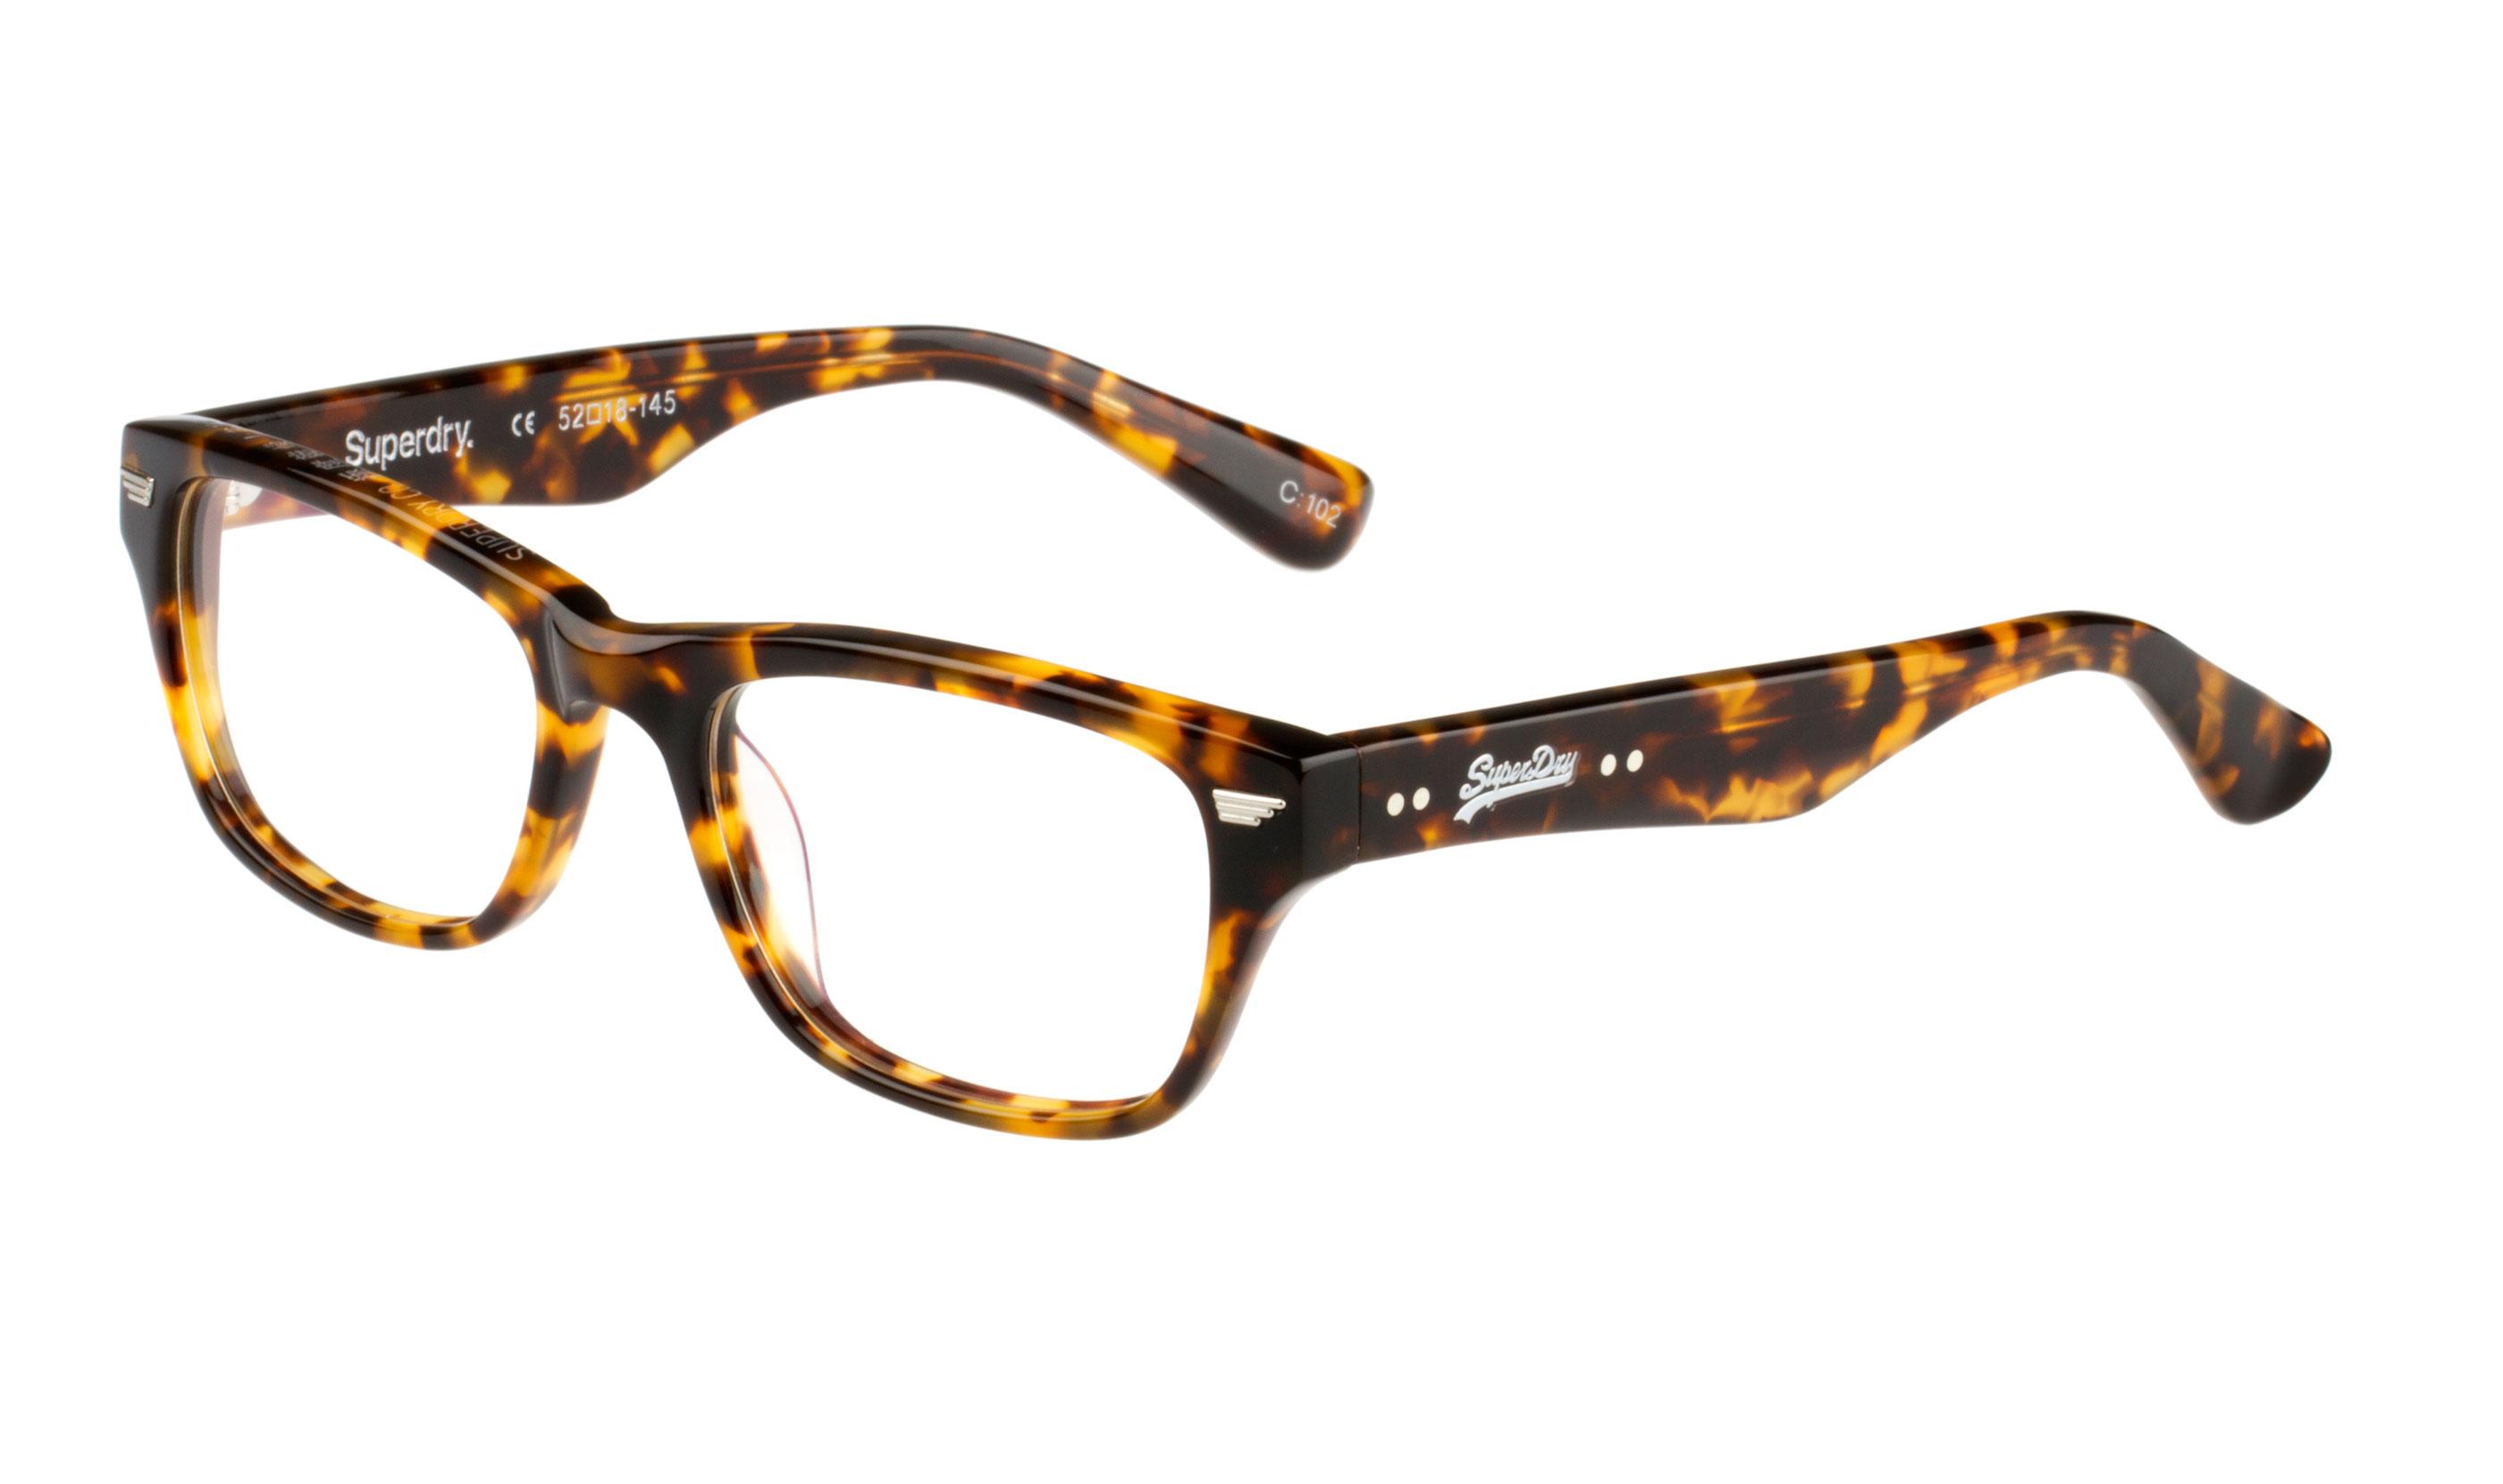 462369ea67a2 Superdry Glasses